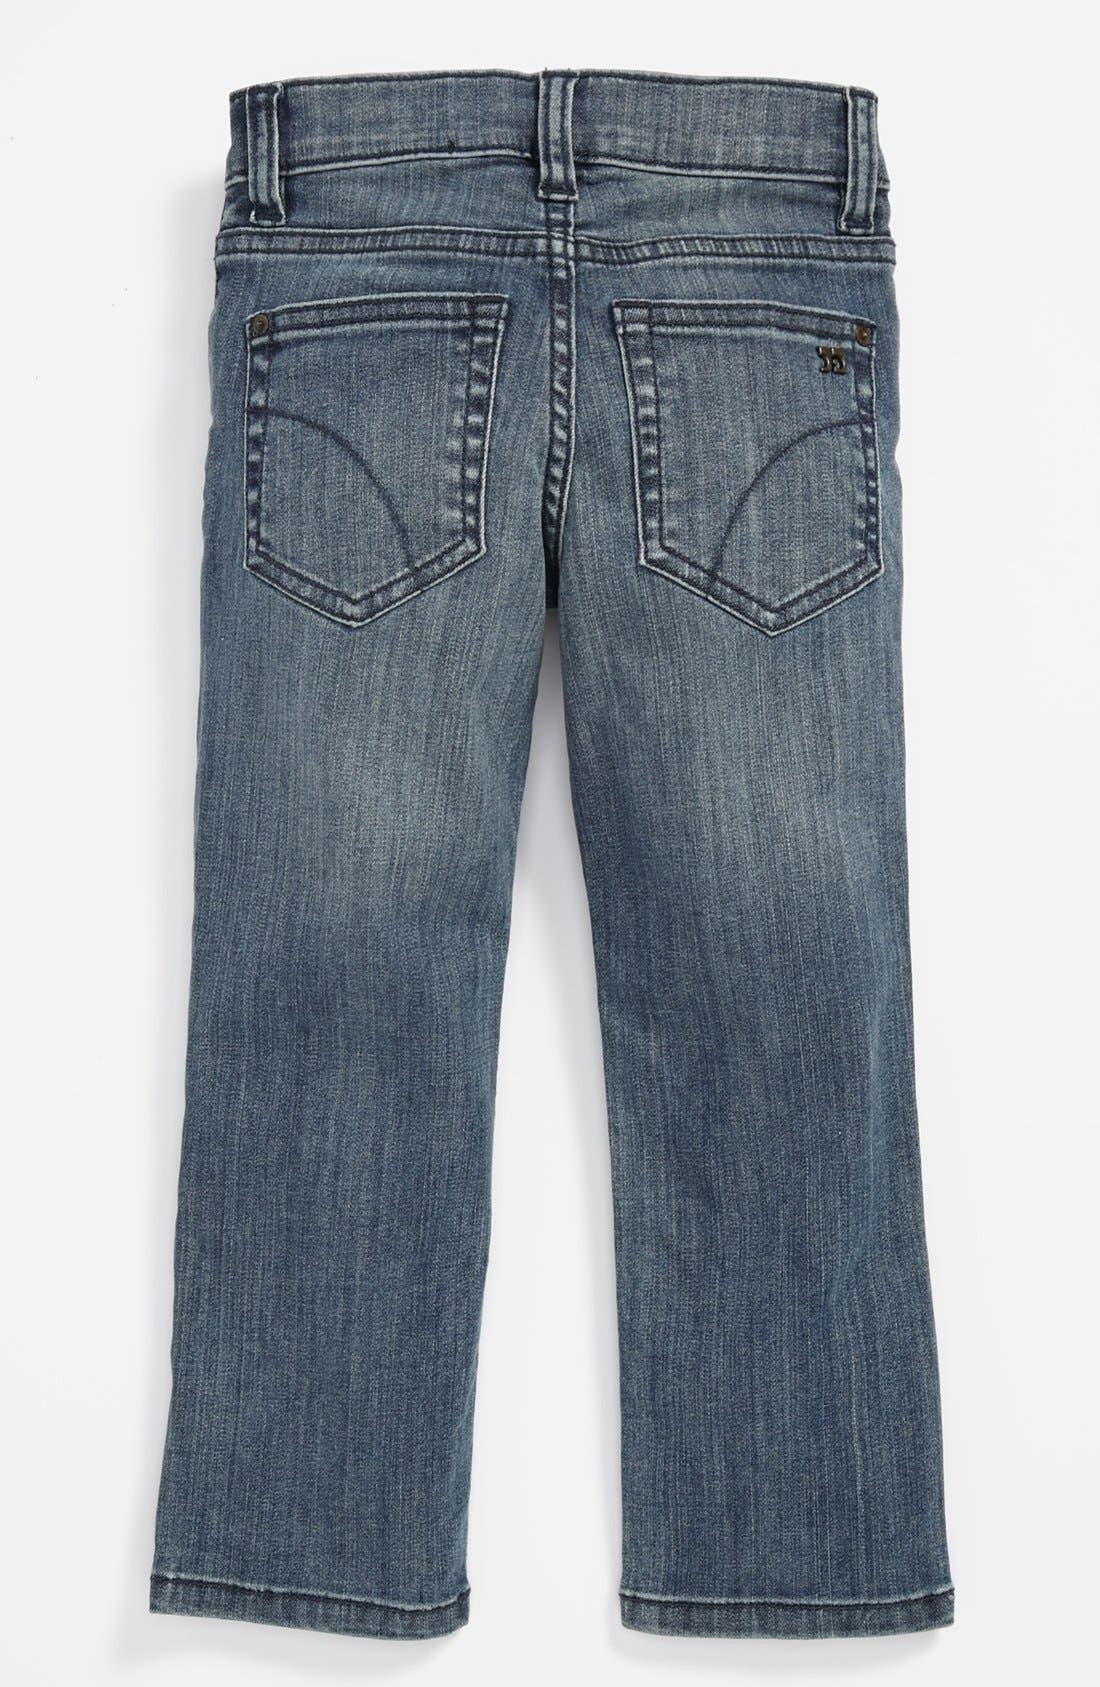 Alternate Image 1 Selected - Joe's 'Brixton' Straight Leg Jeans (Toddler Boys)